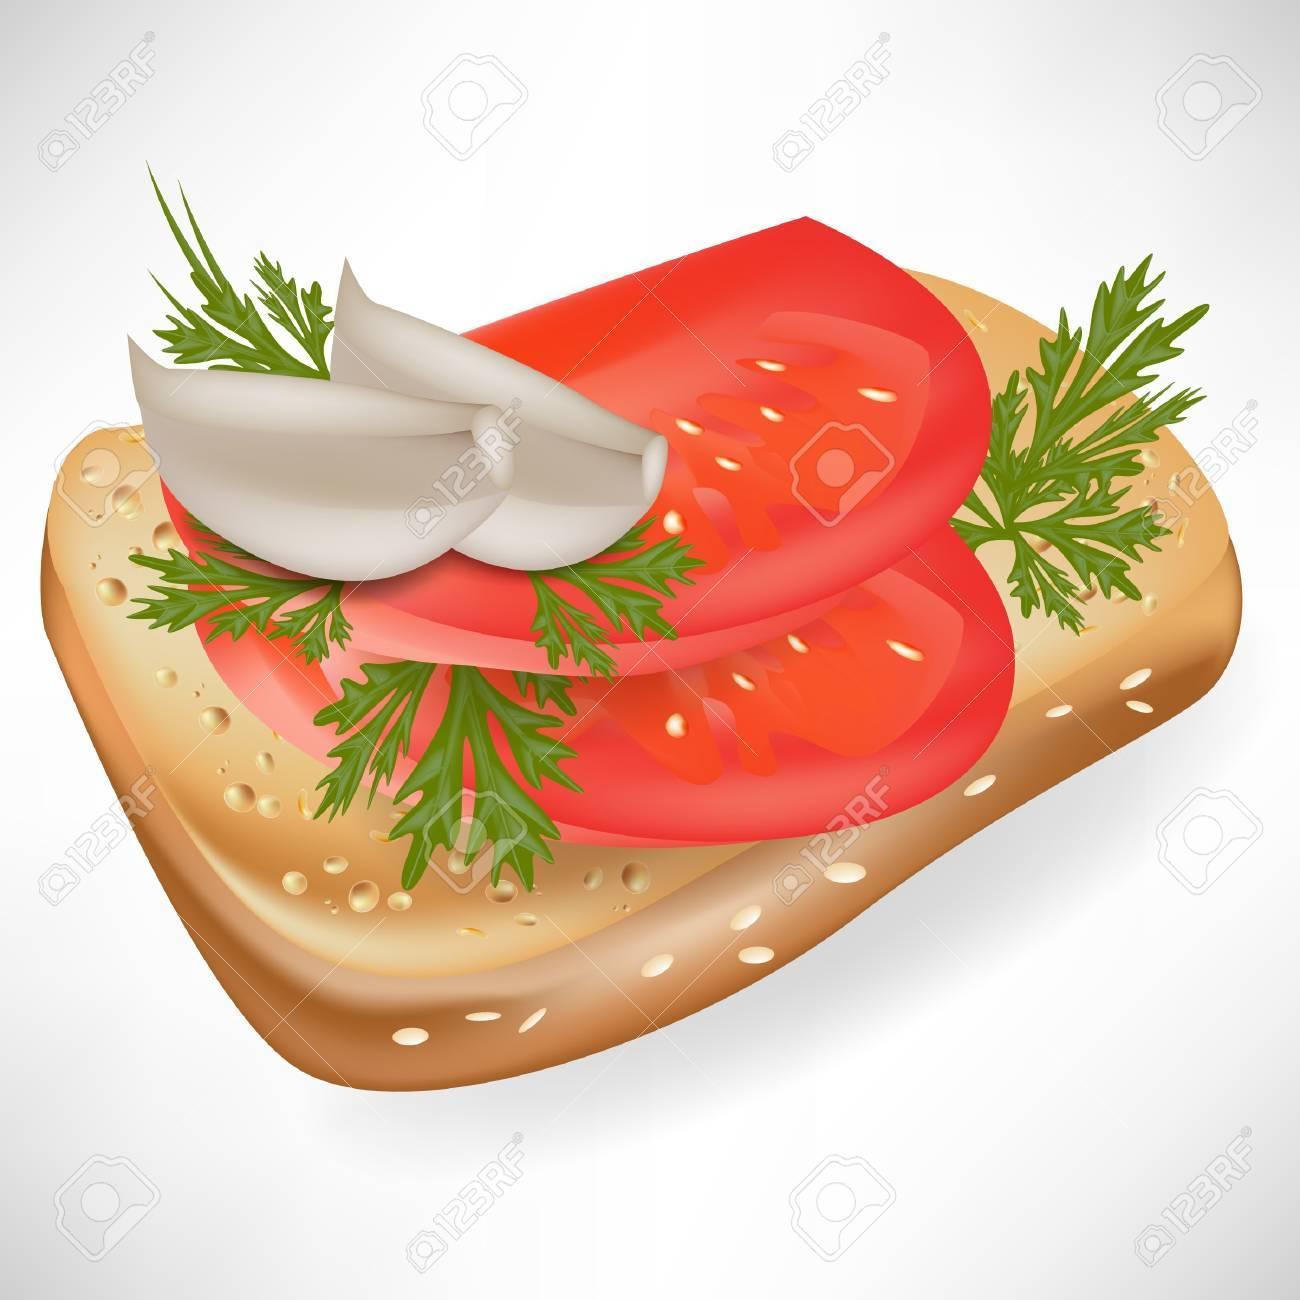 tomato and garlic on bread slice Stock Vector - 10888043